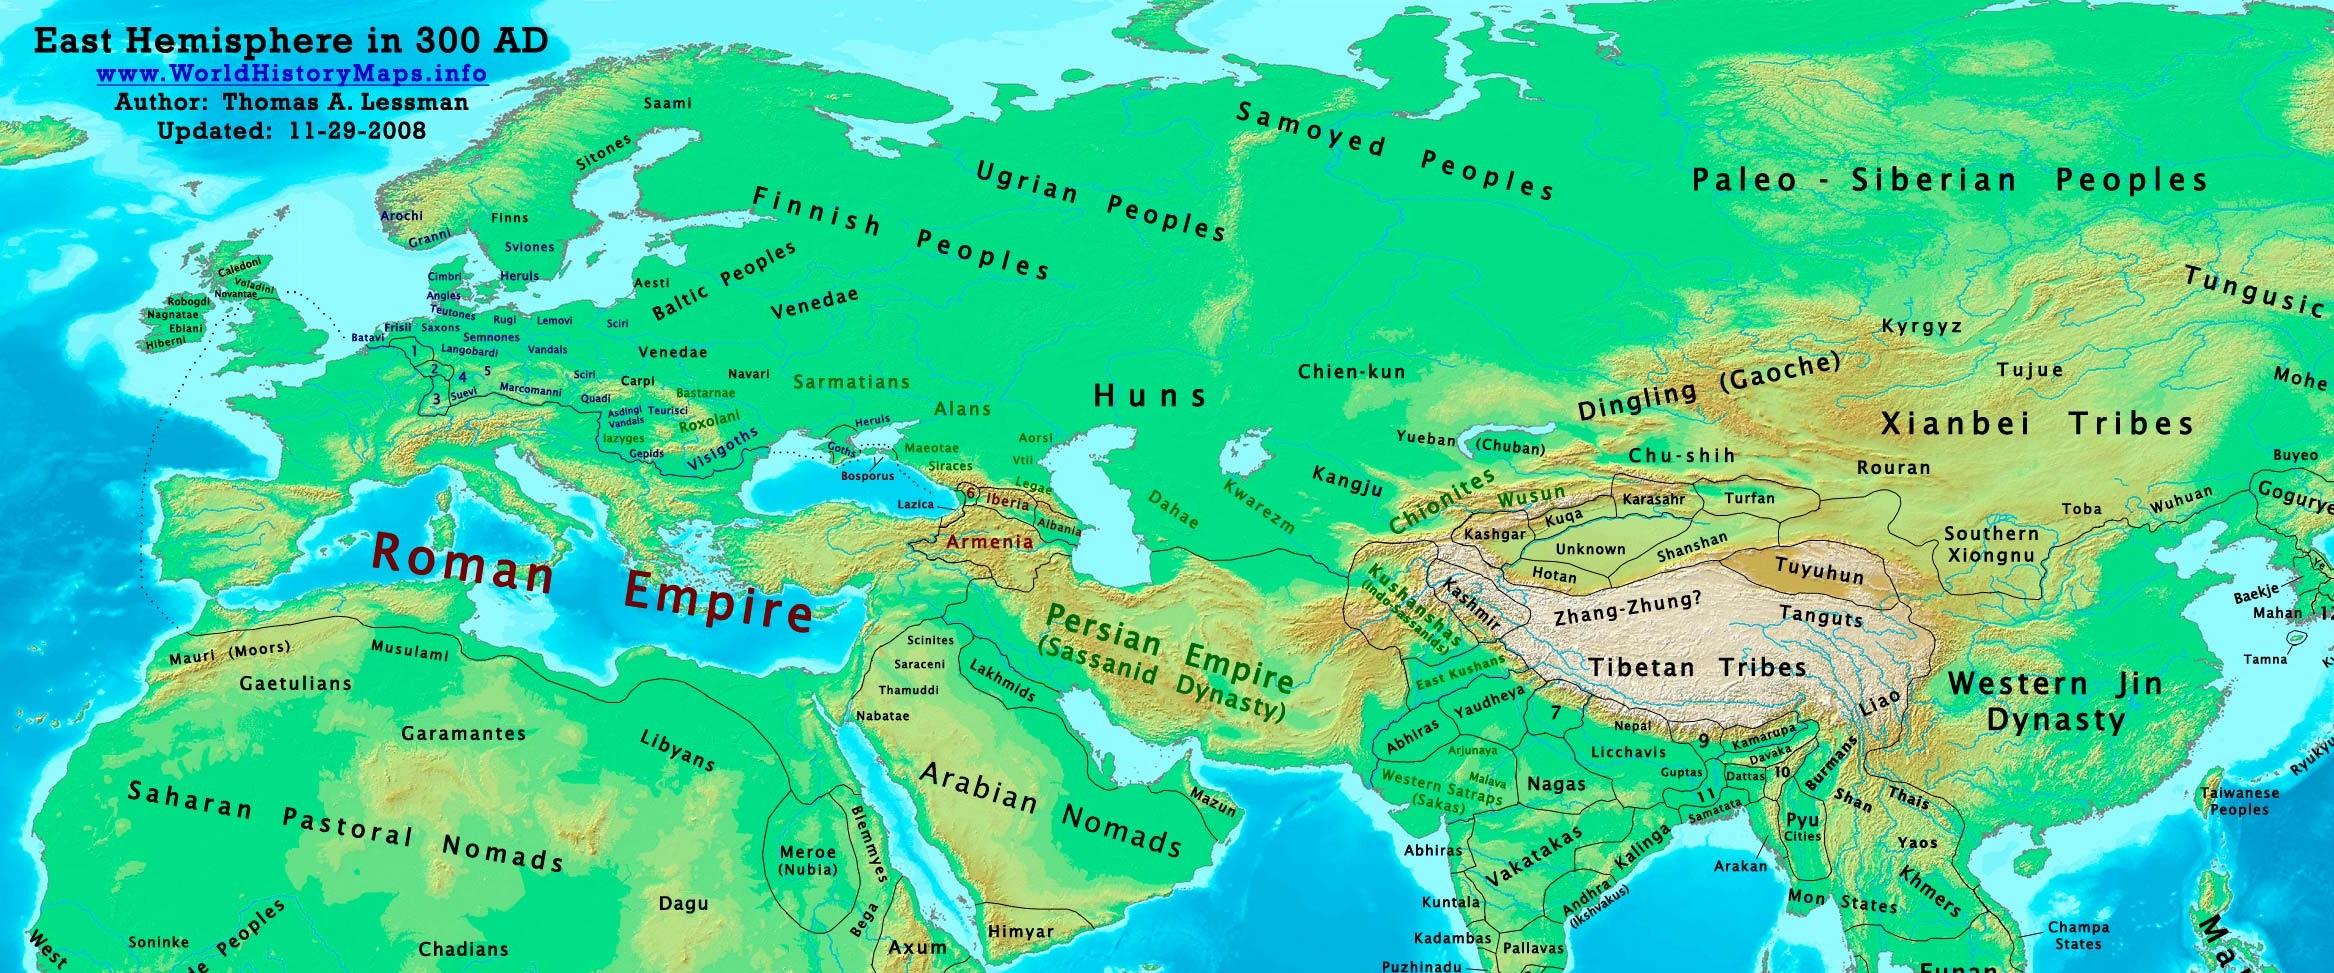 300 AD